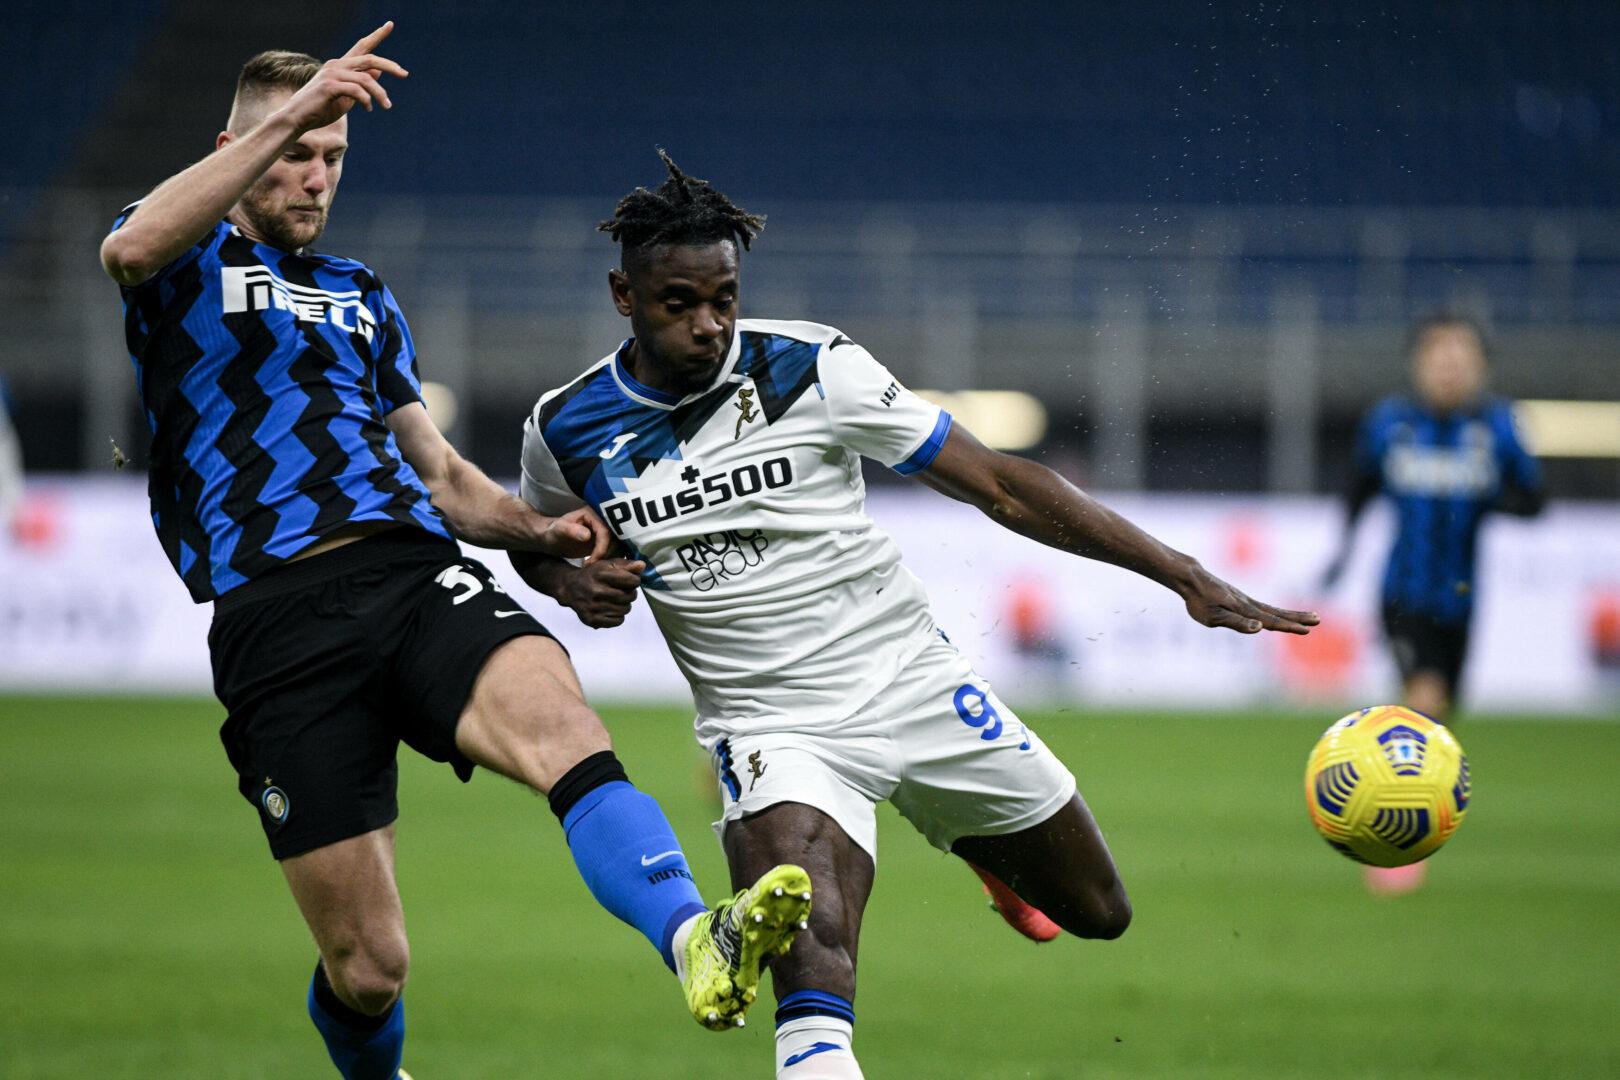 Serie A: Skriniar (Inter) Zapata (Atalanta) im Zweikampf